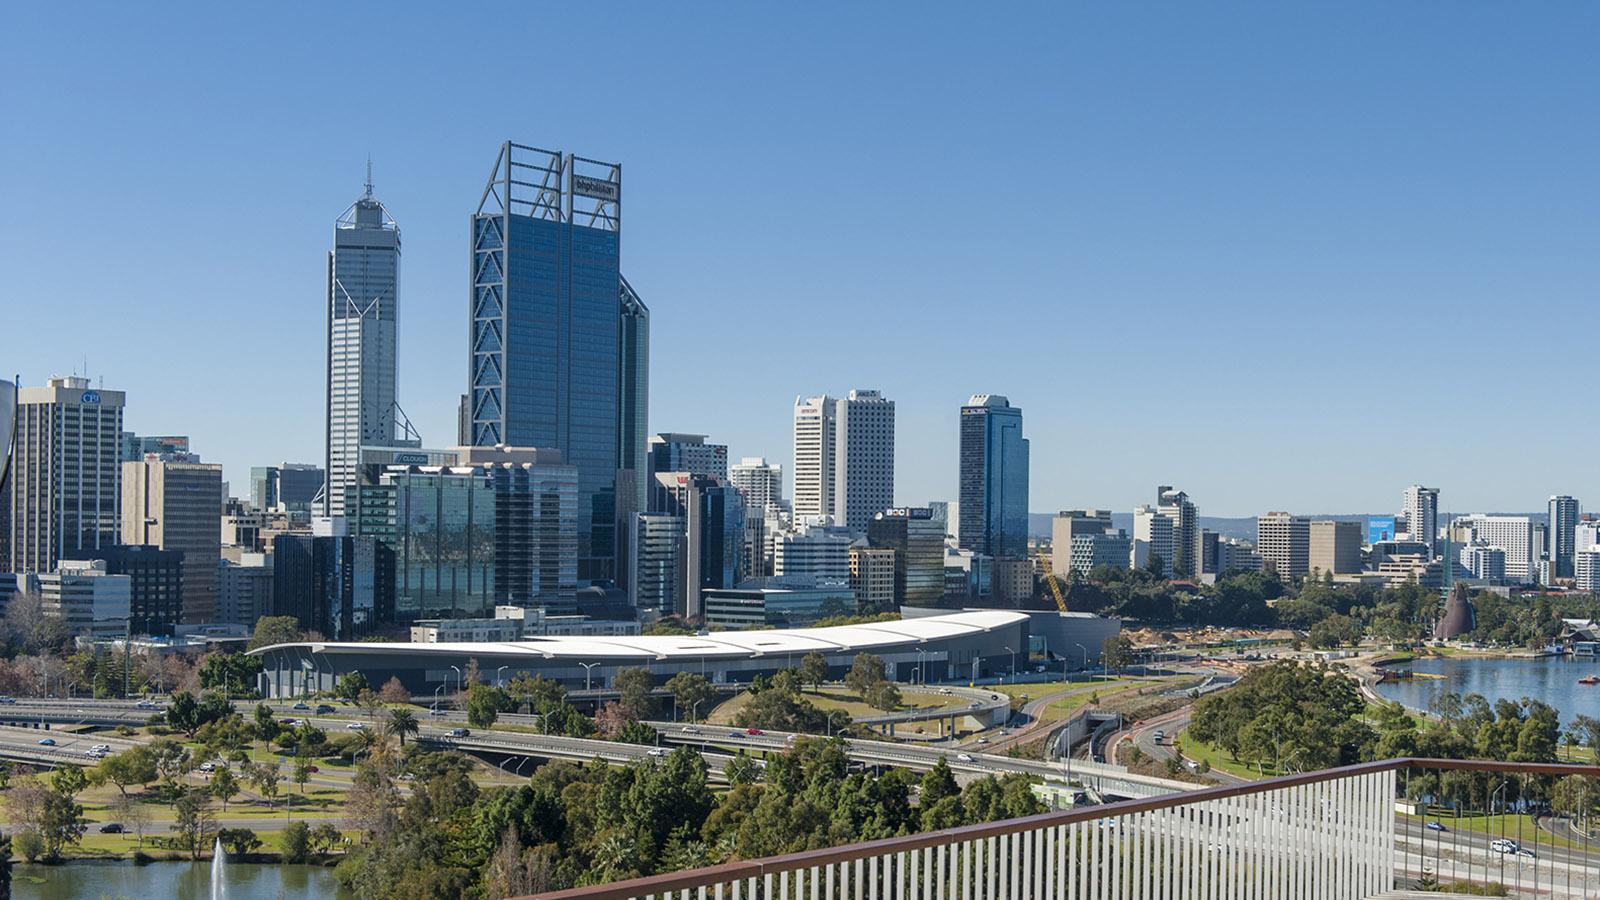 Blick auf Perth vom Kaarta-Gar-Up-Lookout im Kings Park. Foto: Hilke Maunder